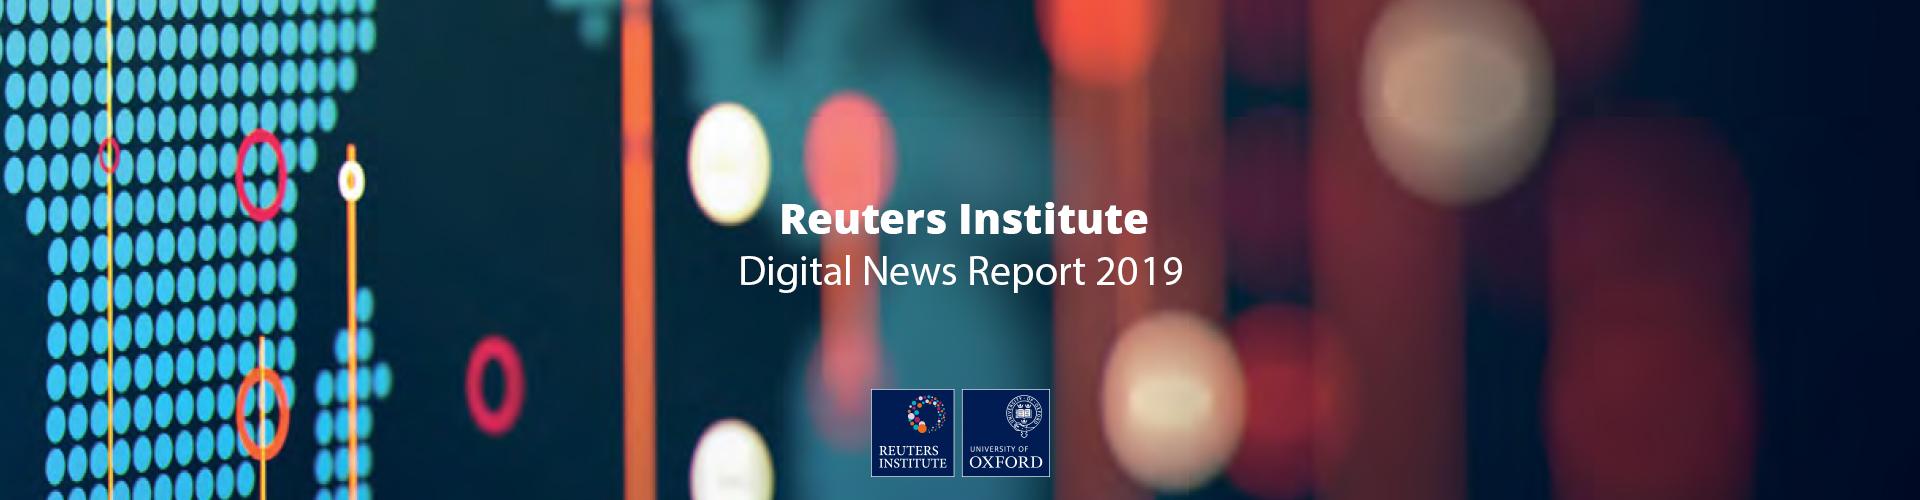 Key Takeaways from Reuters Digital News Report 2019